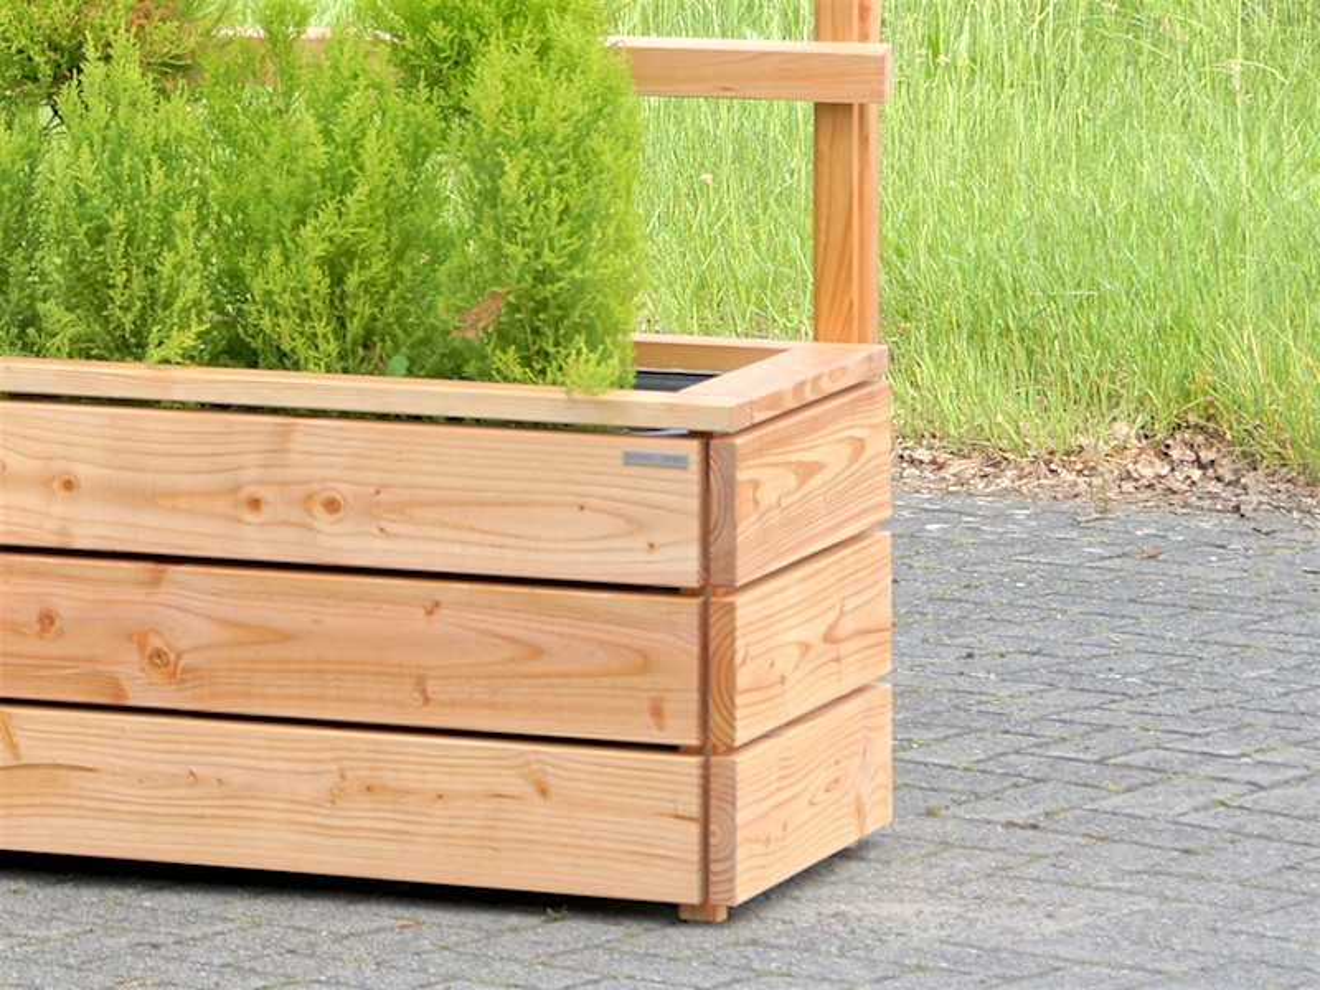 pflanzkasten ecke mit rankgitter heimisches holz made in germany. Black Bedroom Furniture Sets. Home Design Ideas